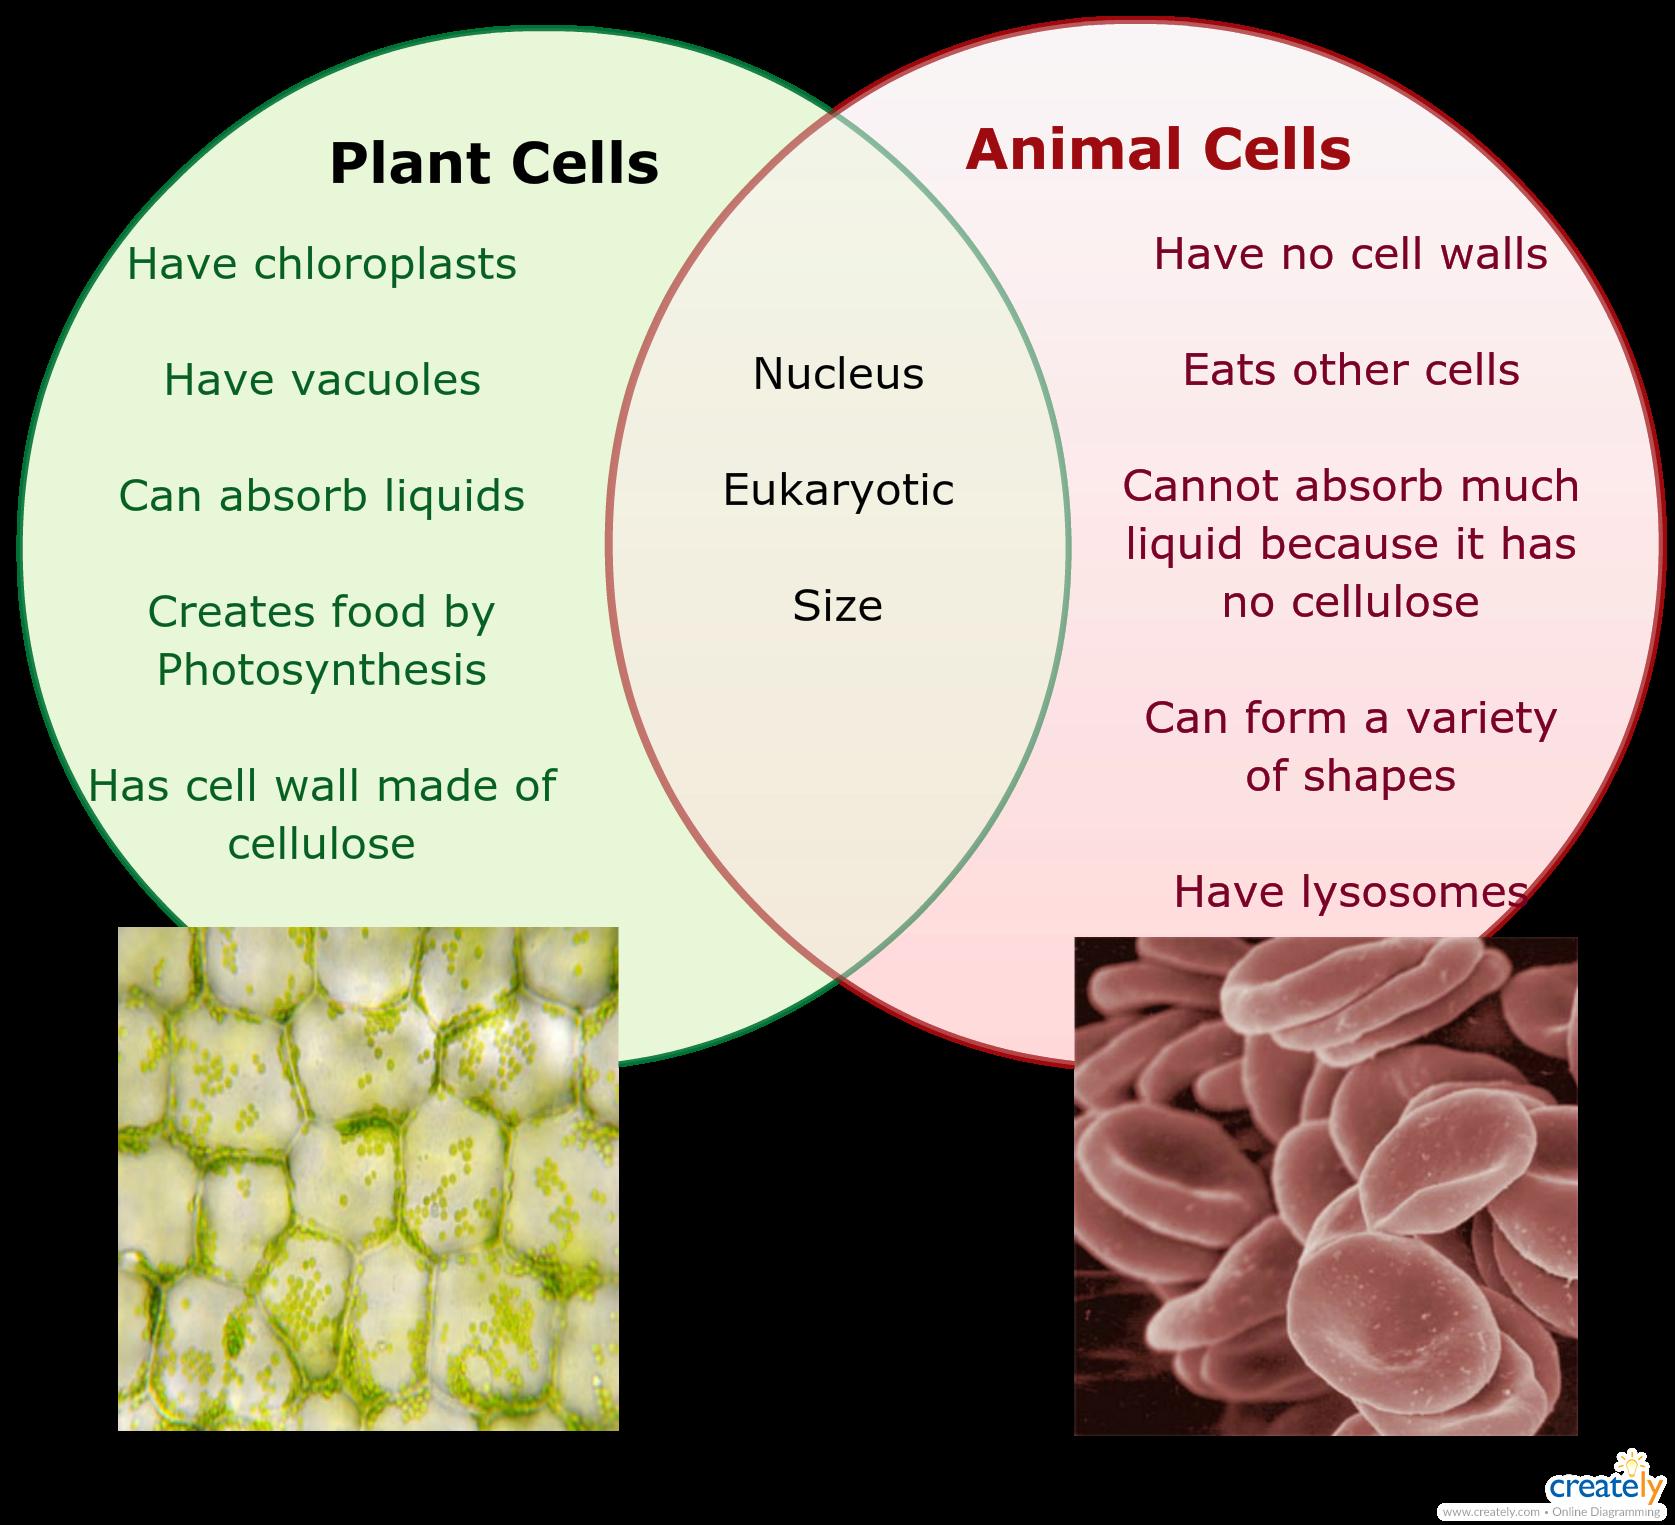 hight resolution of plant vs animal cells venn diagram for educational purposes venn diagram